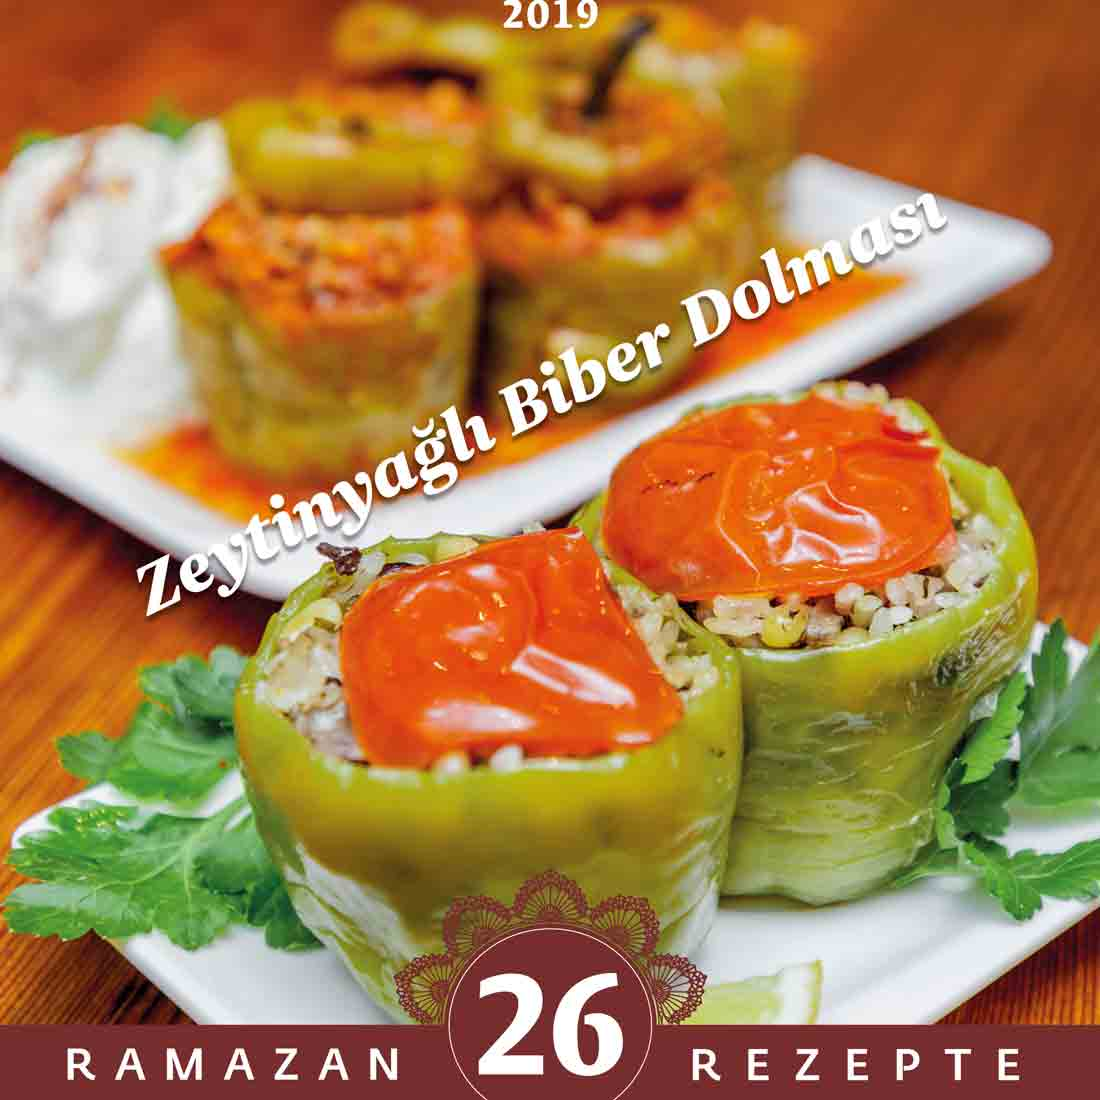 Ramadan 2019 jpeg 26